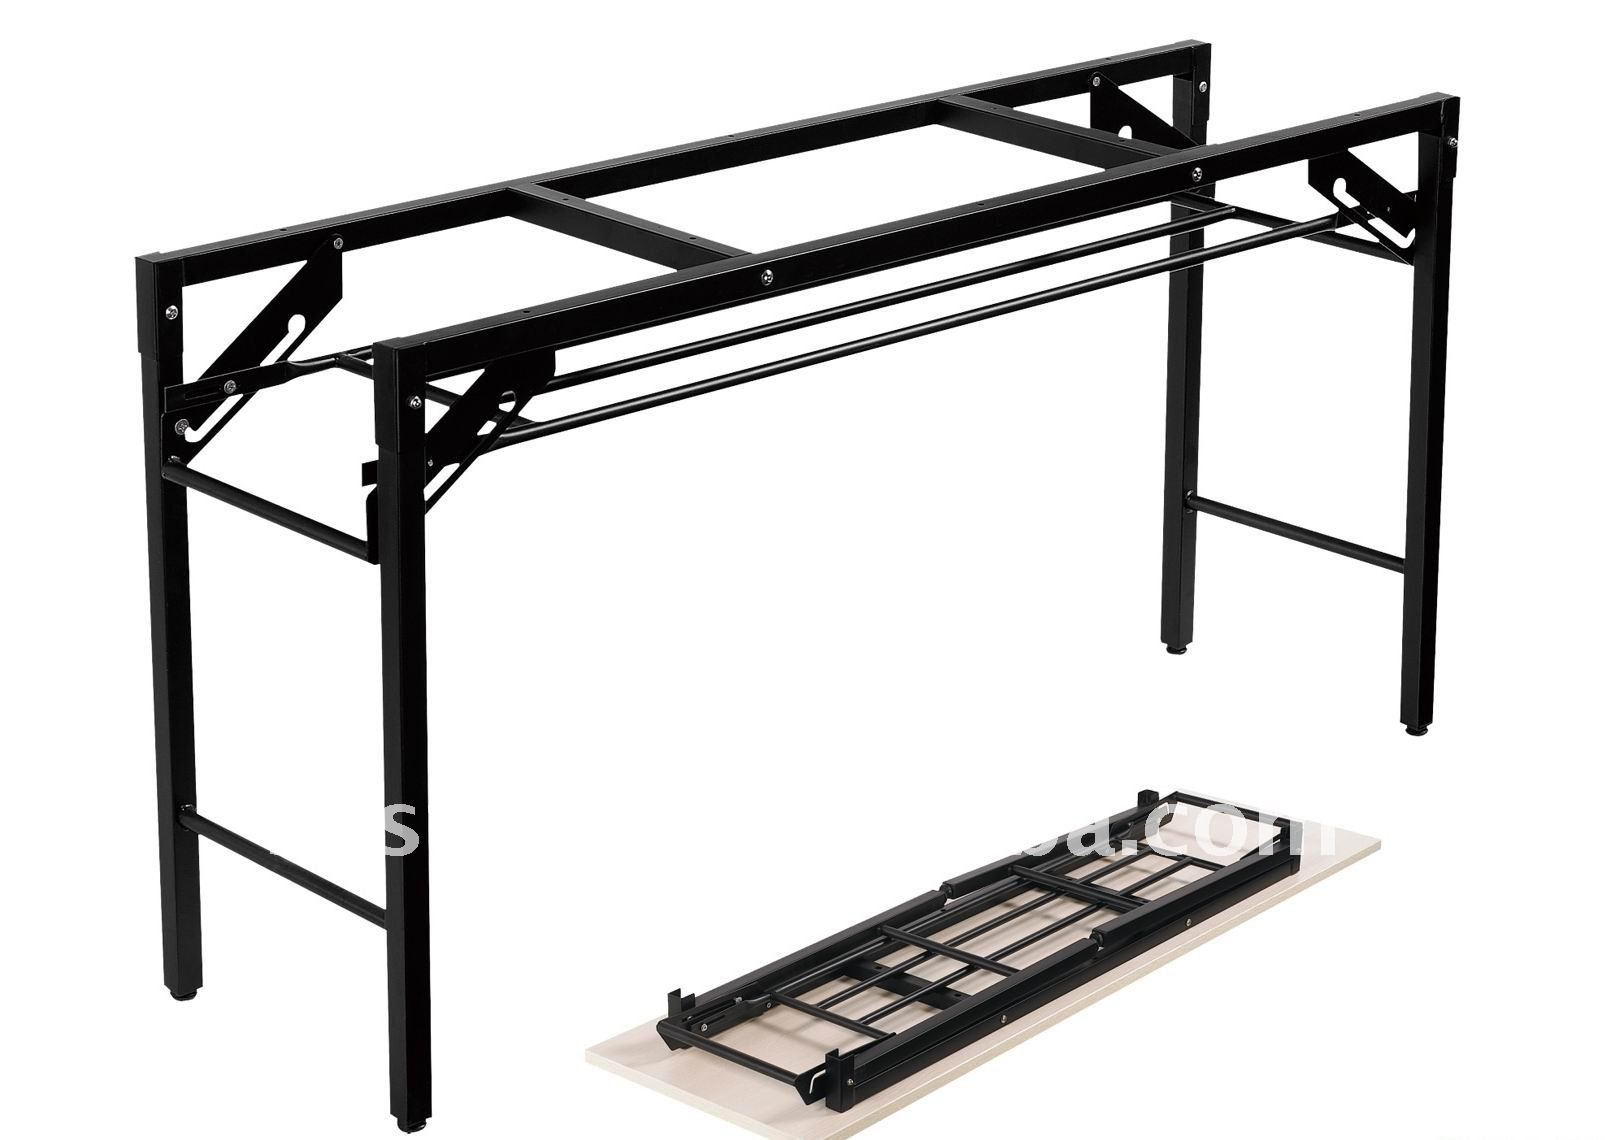 Metal Training Foldable Table Frame - Buy Foldable Table Frame ...